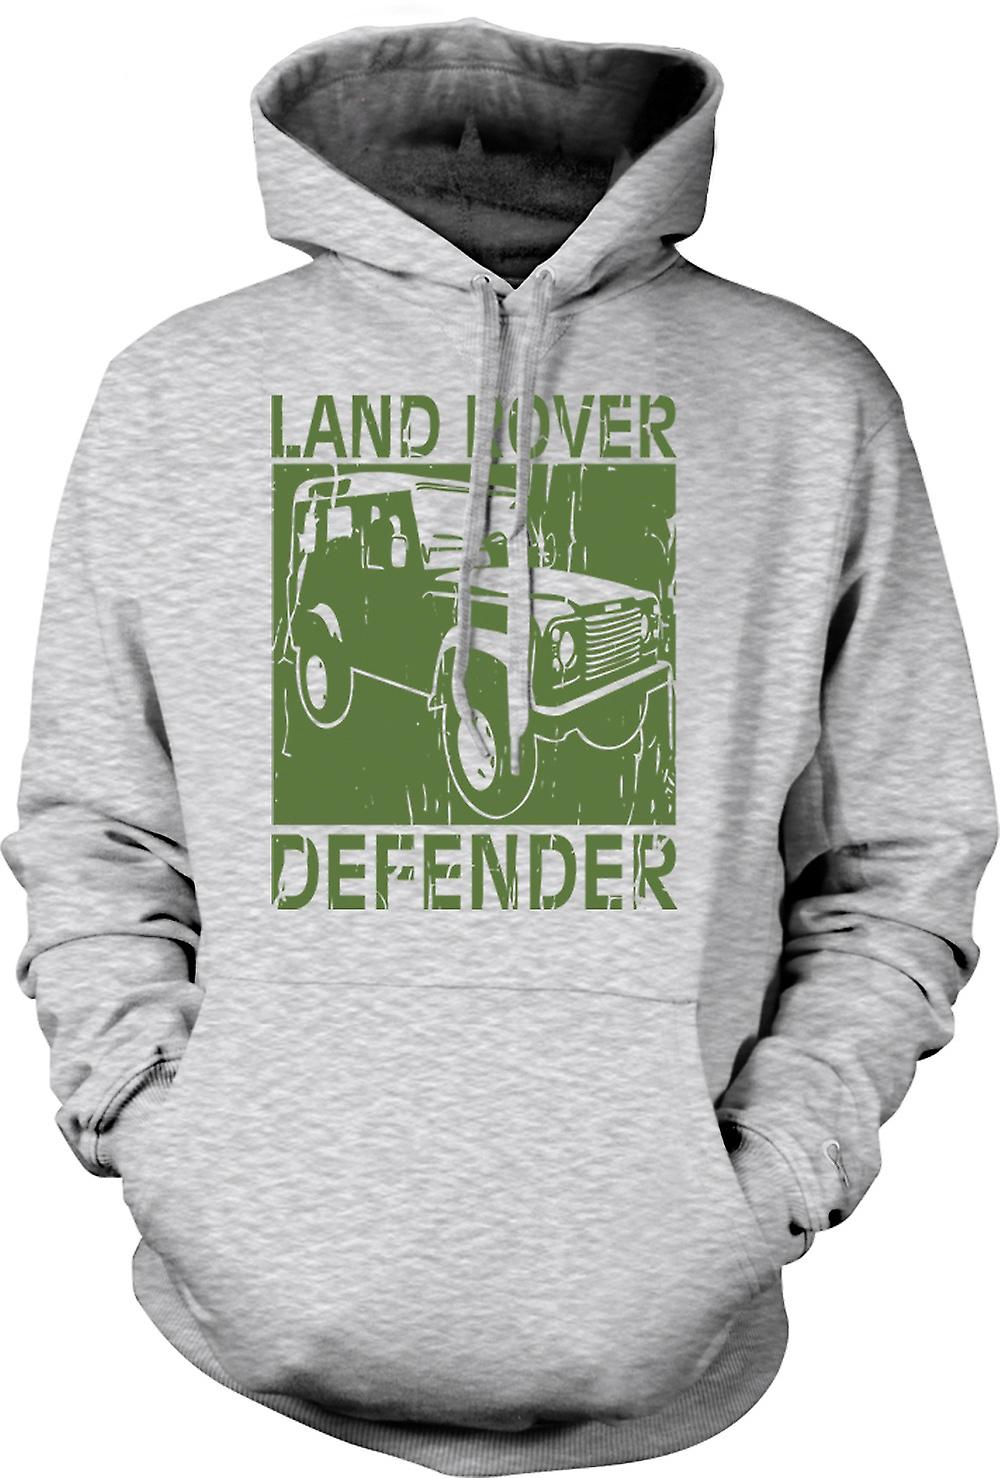 Mens Hoodie - Landrover Defender Offroad